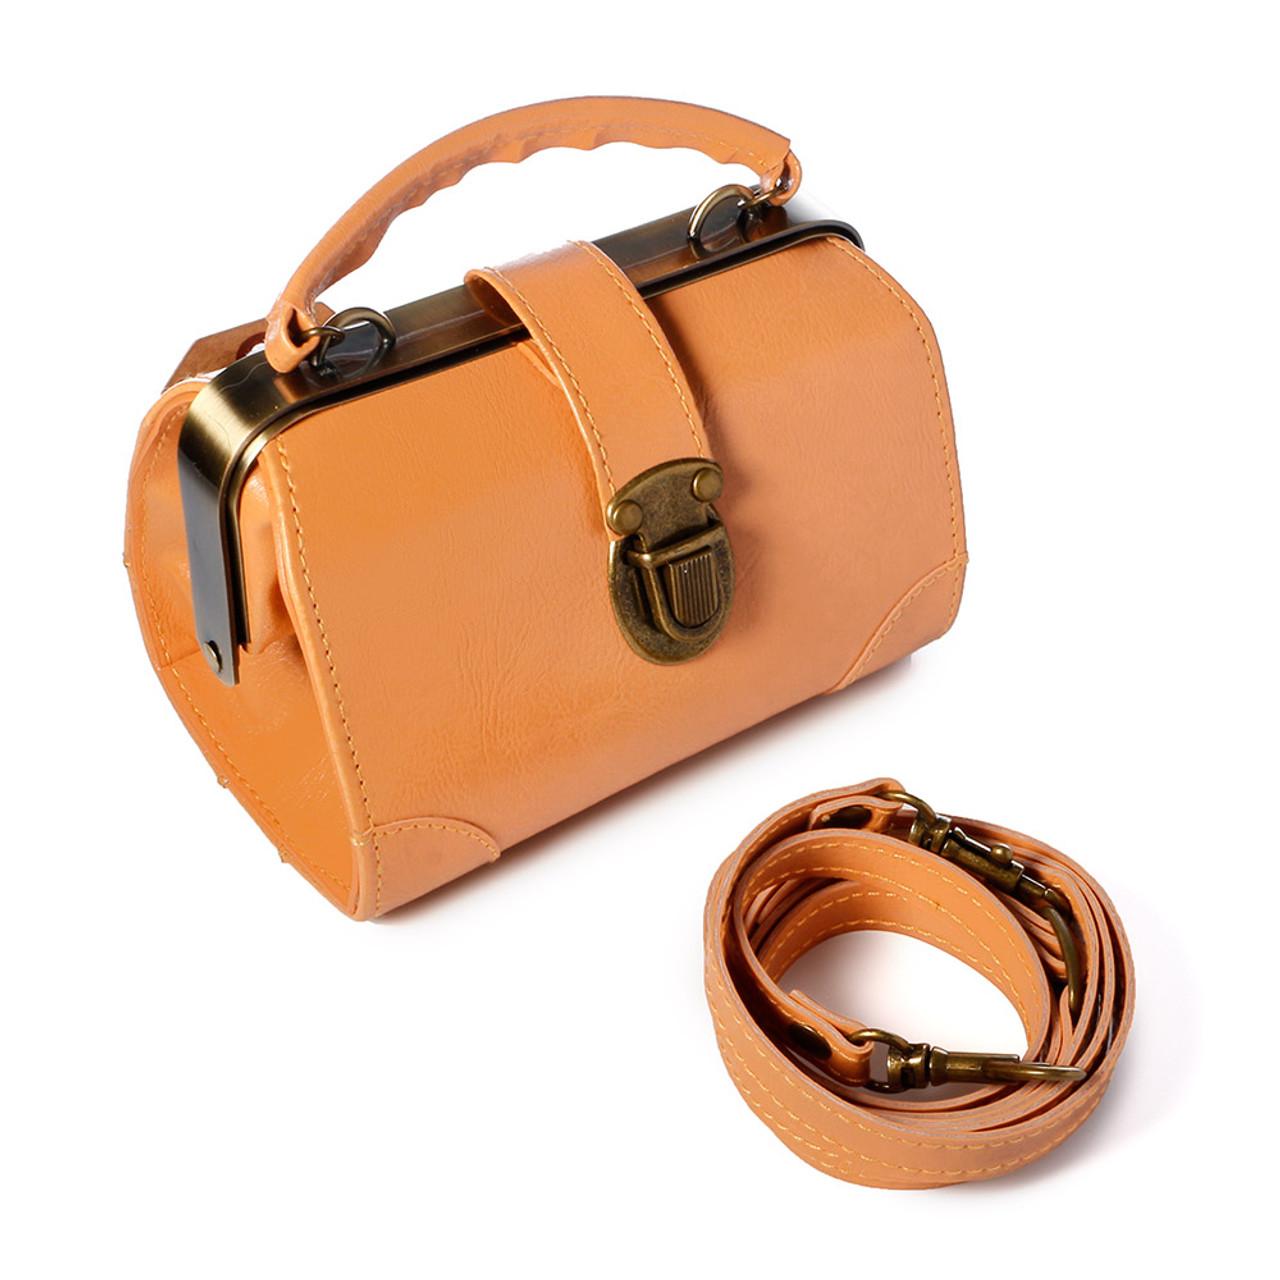 Seto Craft Motif Mini Doctor Bag Shape Pouch / Cosmetic Bag - Camel Color ( Feature 01 )